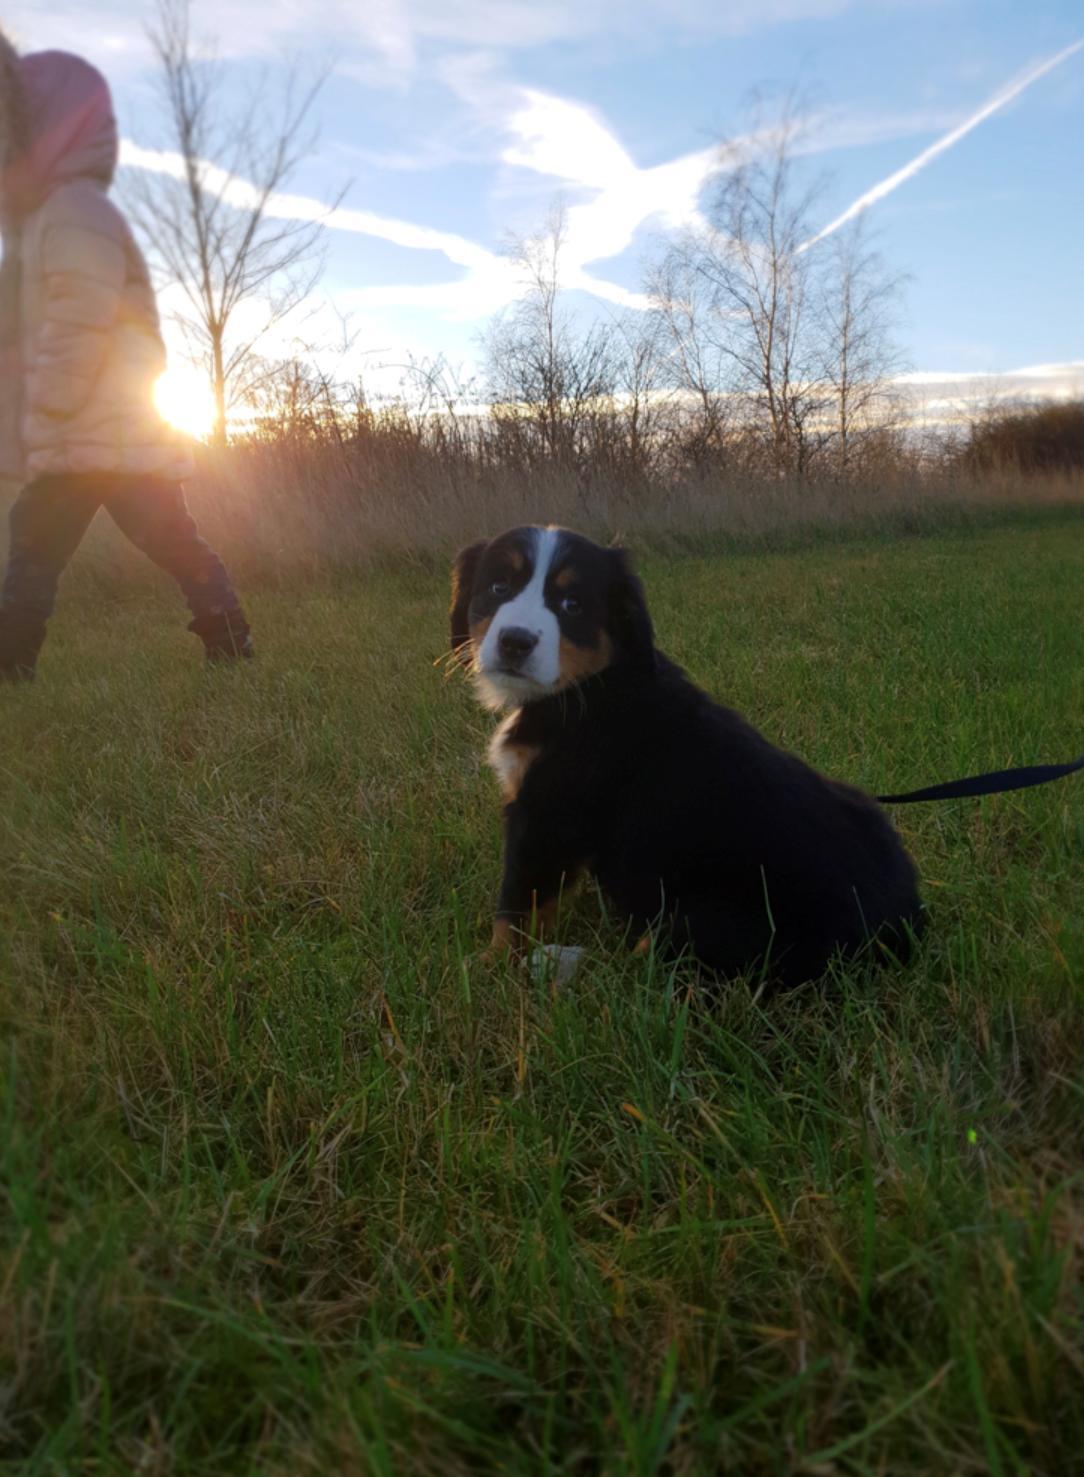 Berner sennenhund Toffie billede 6